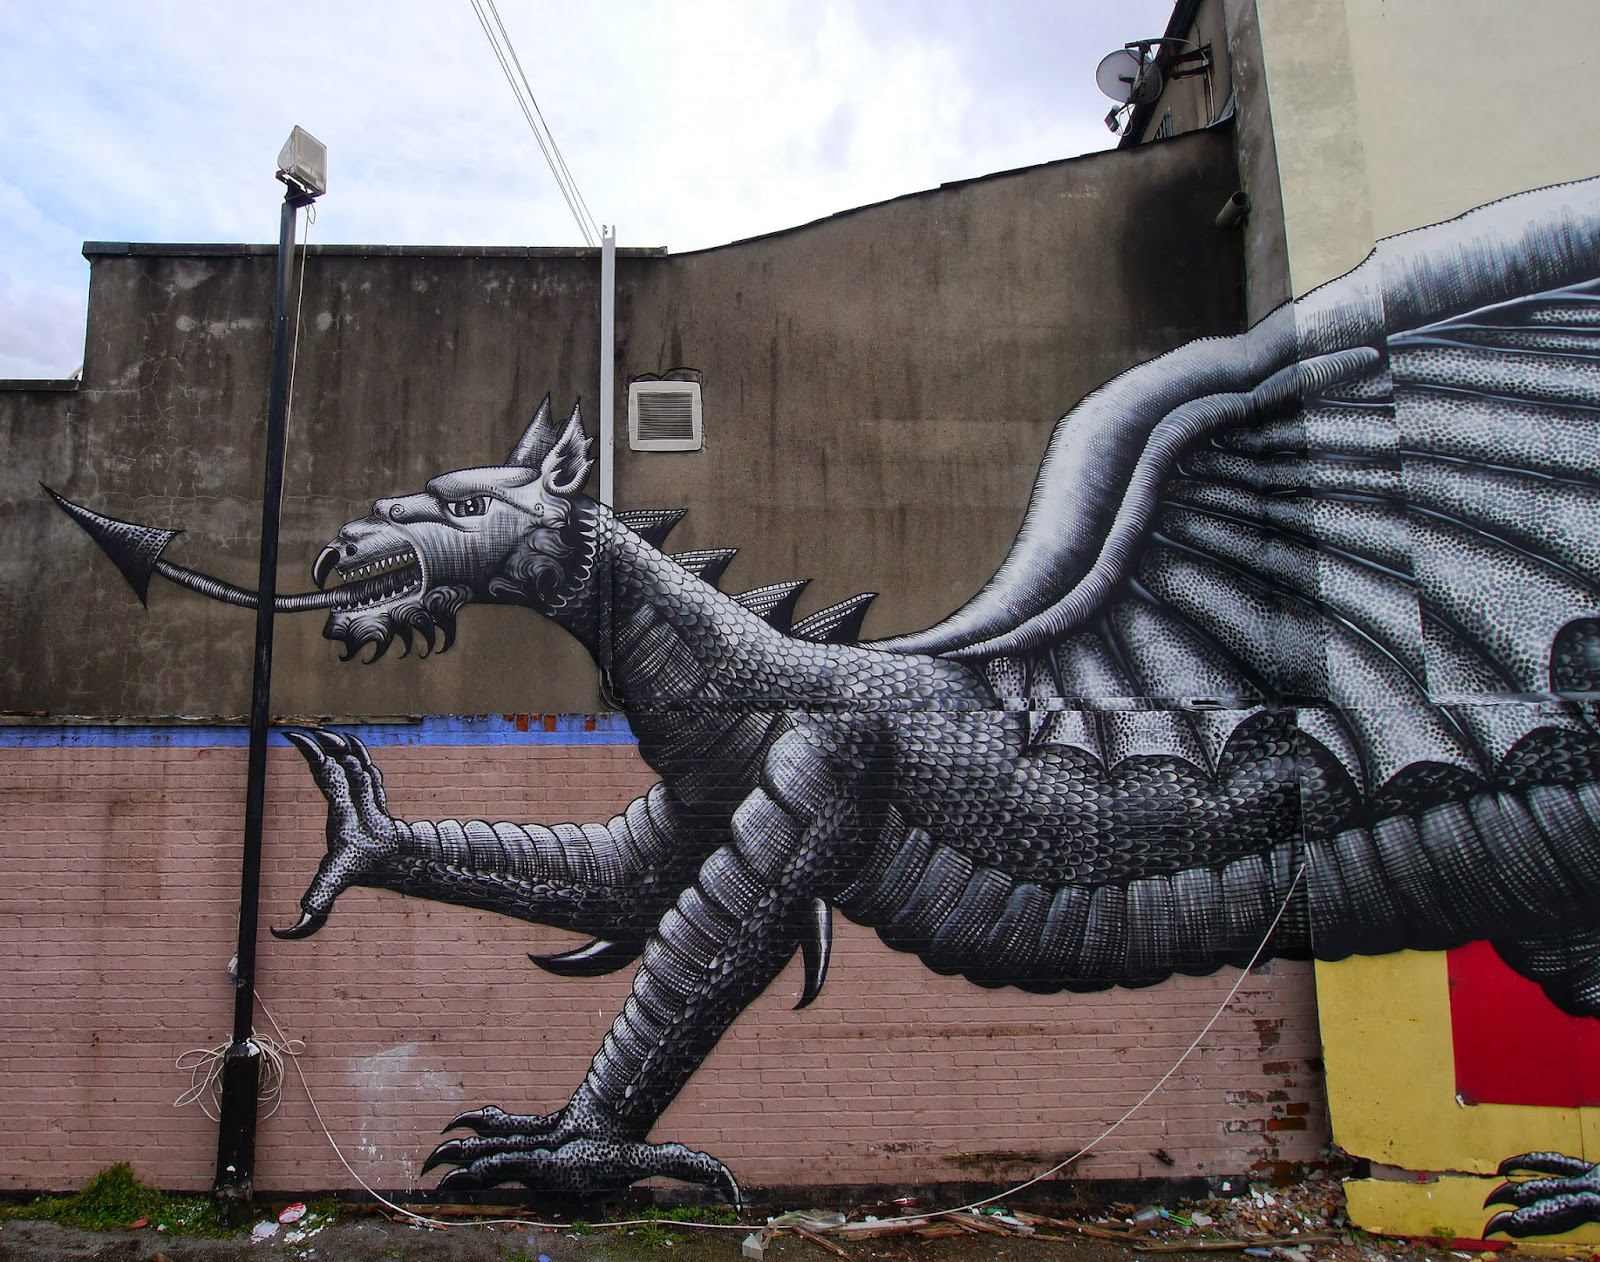 phlegm-new-mural-roath-cardiff-02